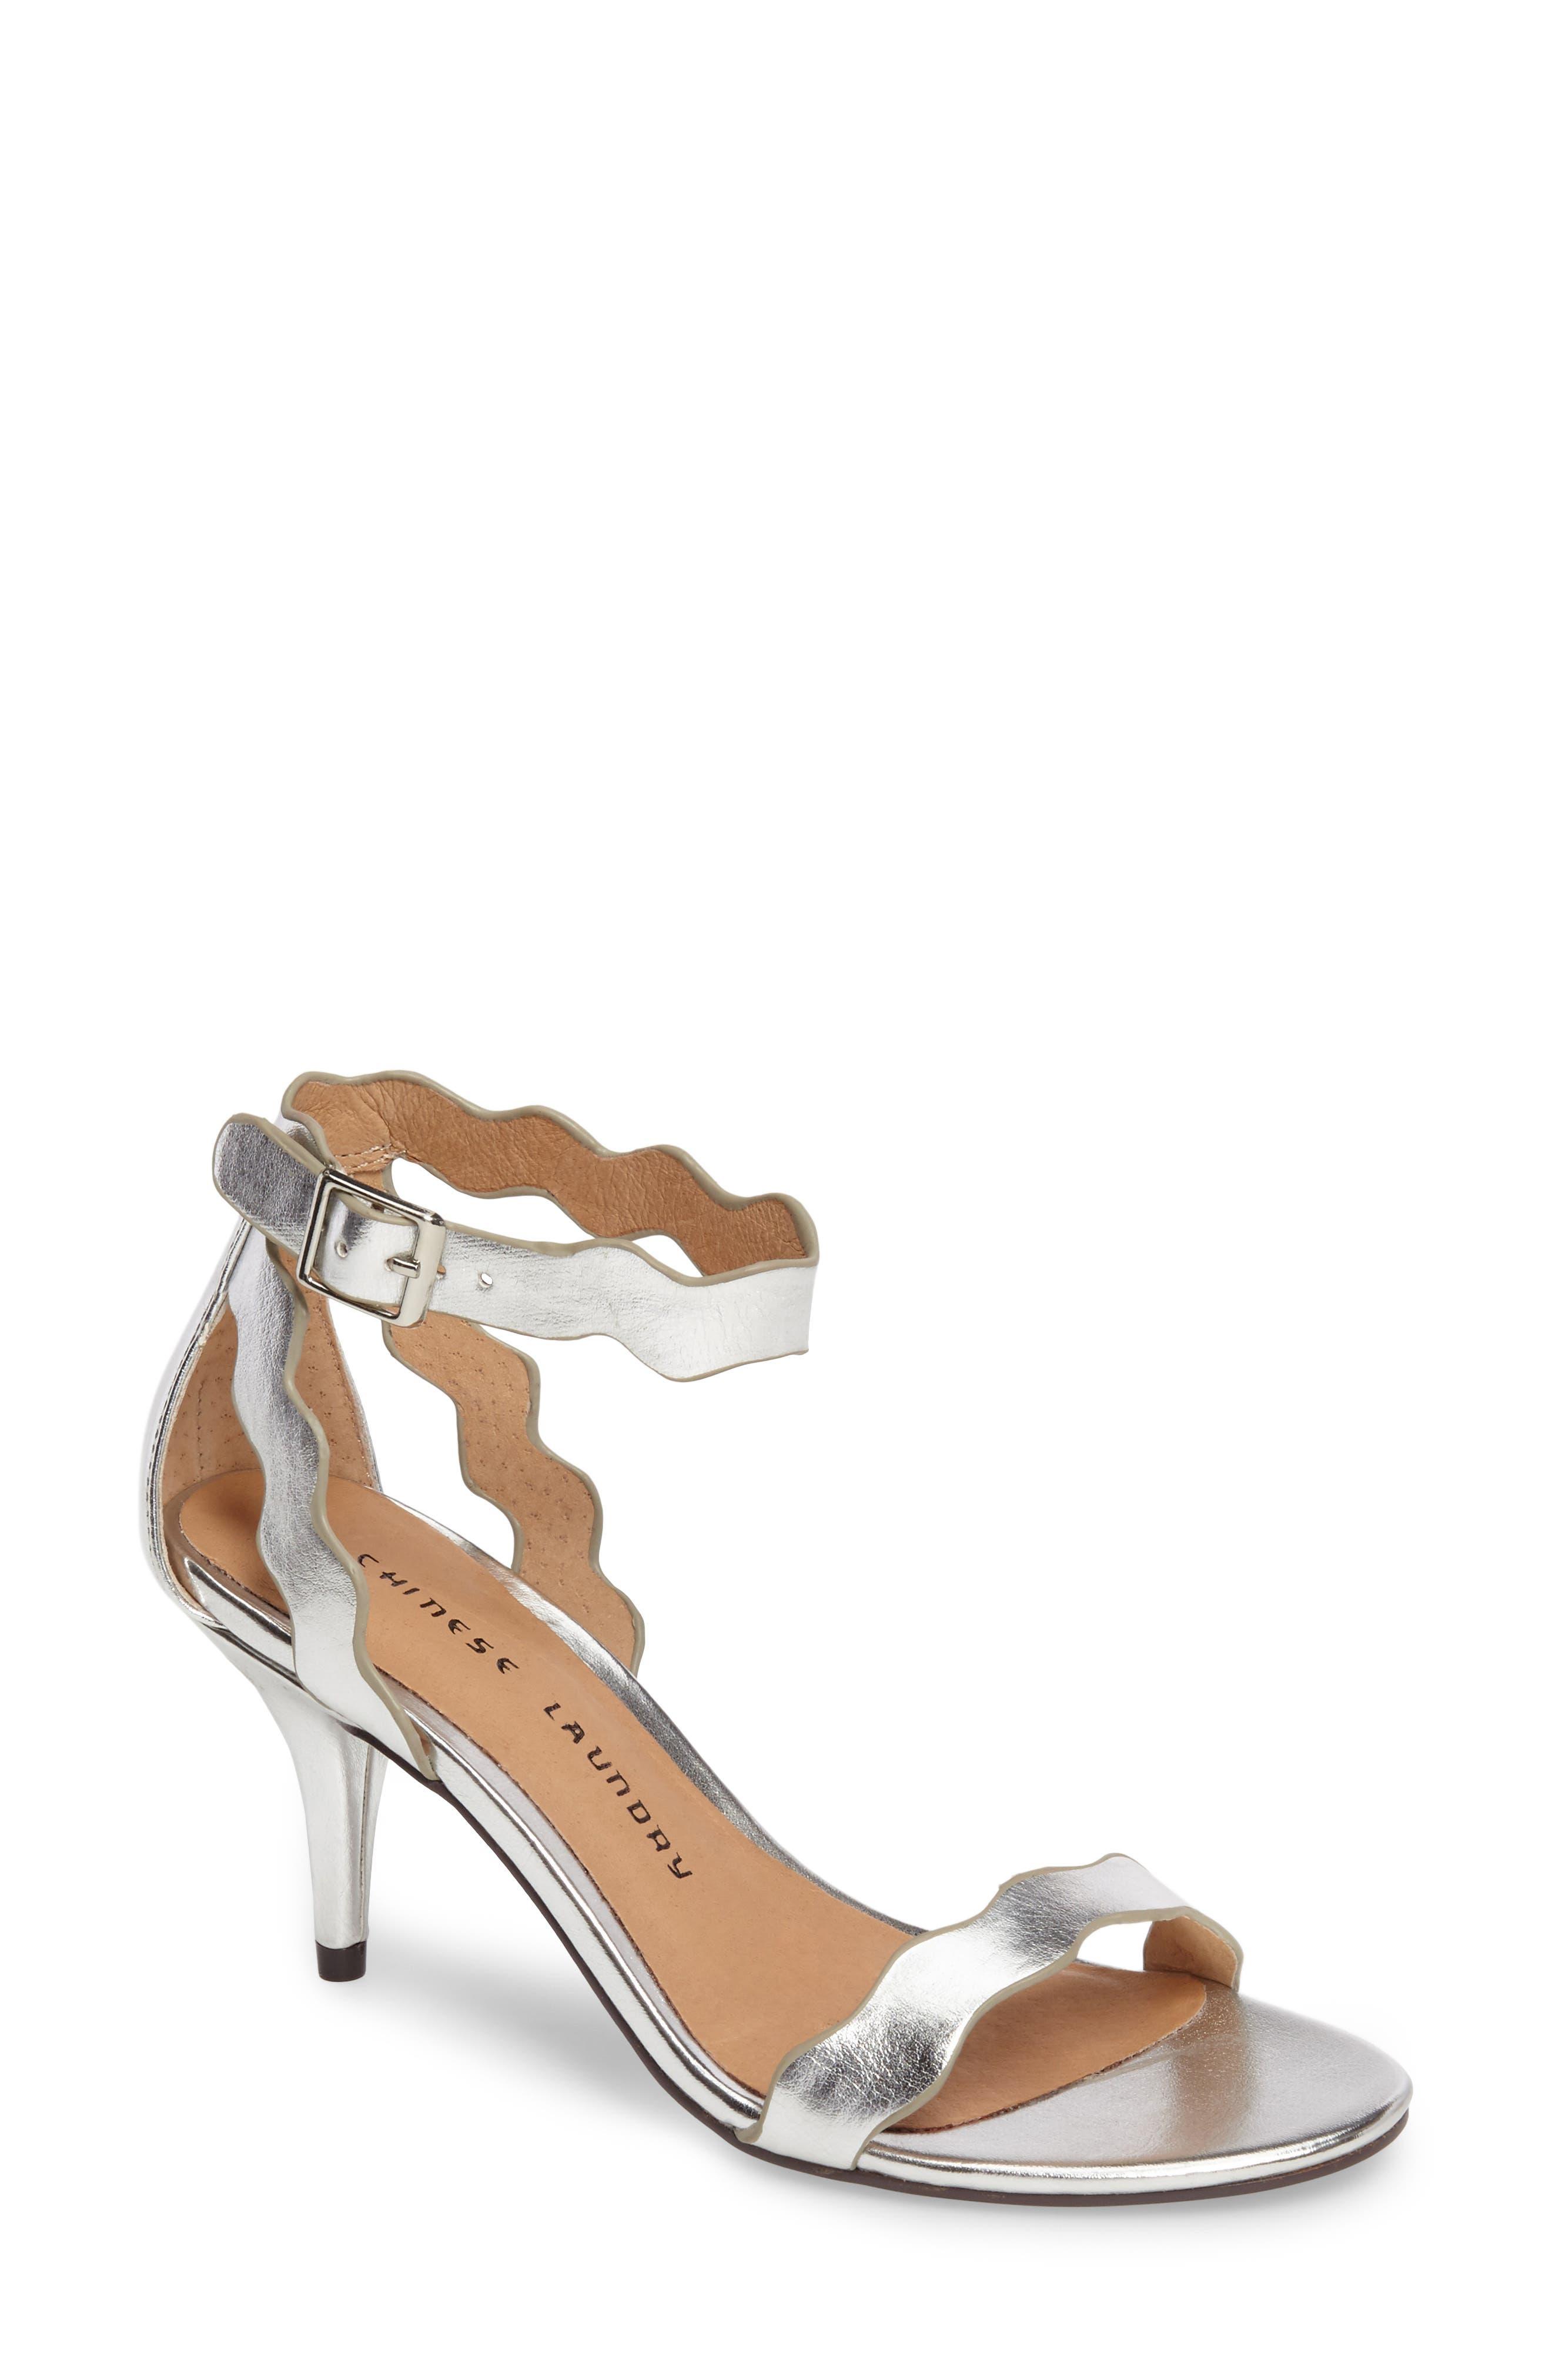 'Rubie' Scalloped Ankle Strap Sandal,                             Main thumbnail 1, color,                             040